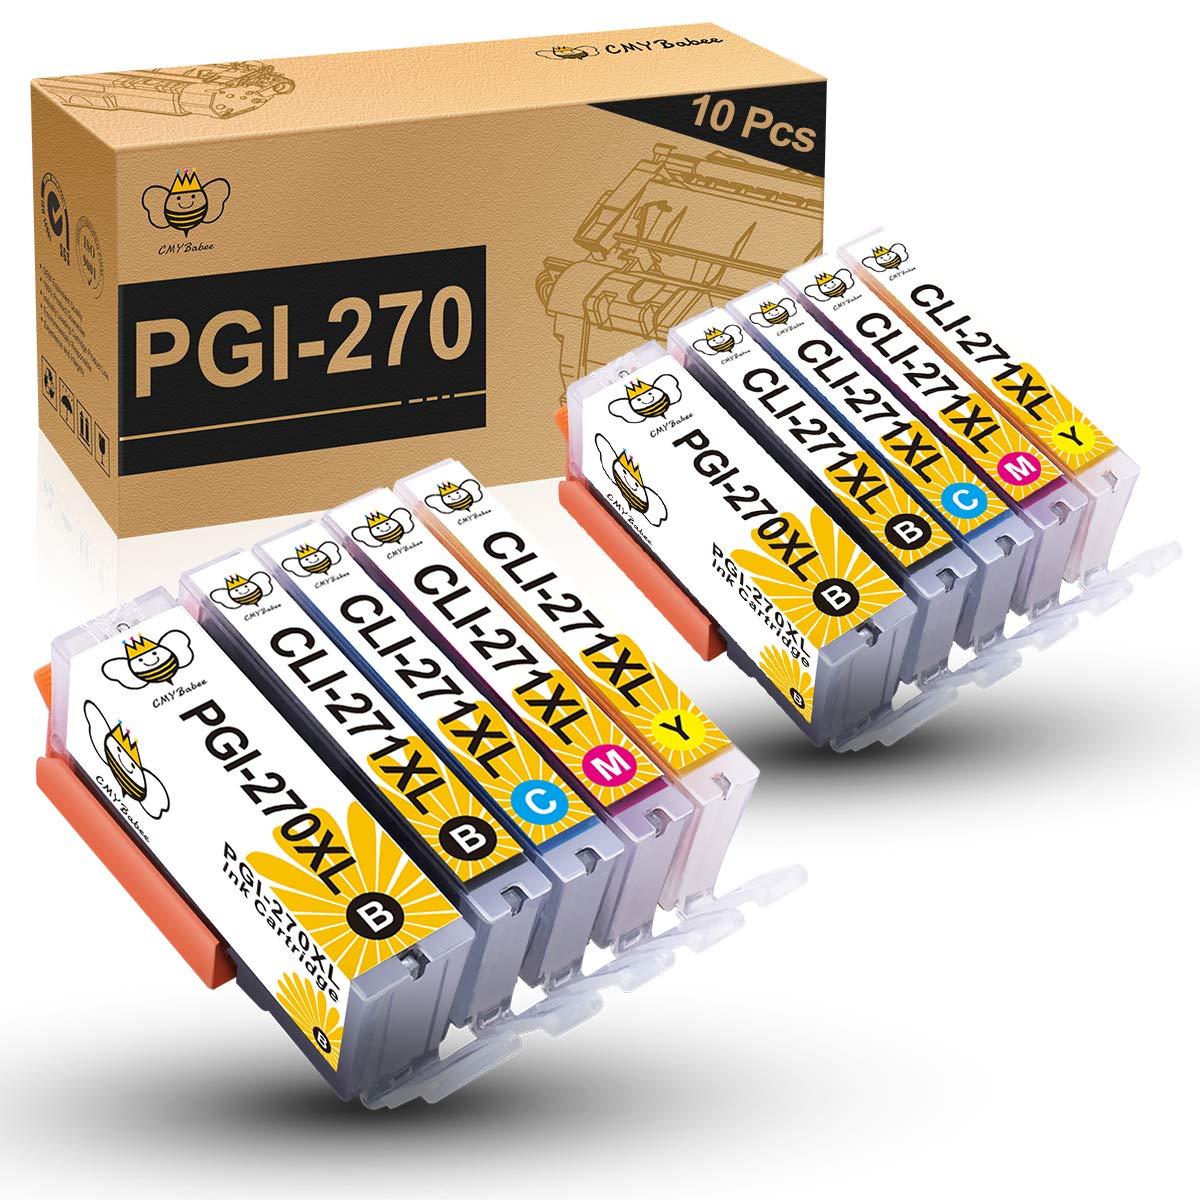 CMYBabee Compatible Ink Cartridge Replacement for Canon PGI-270XL CLI-271XL PGI 270 XL CLI 271XL for PIXMA MG6820 MG5720 MG6821 MG5722 TS9020 Printer (2PB,2BK,2C,2Y,2M,10-Pack)